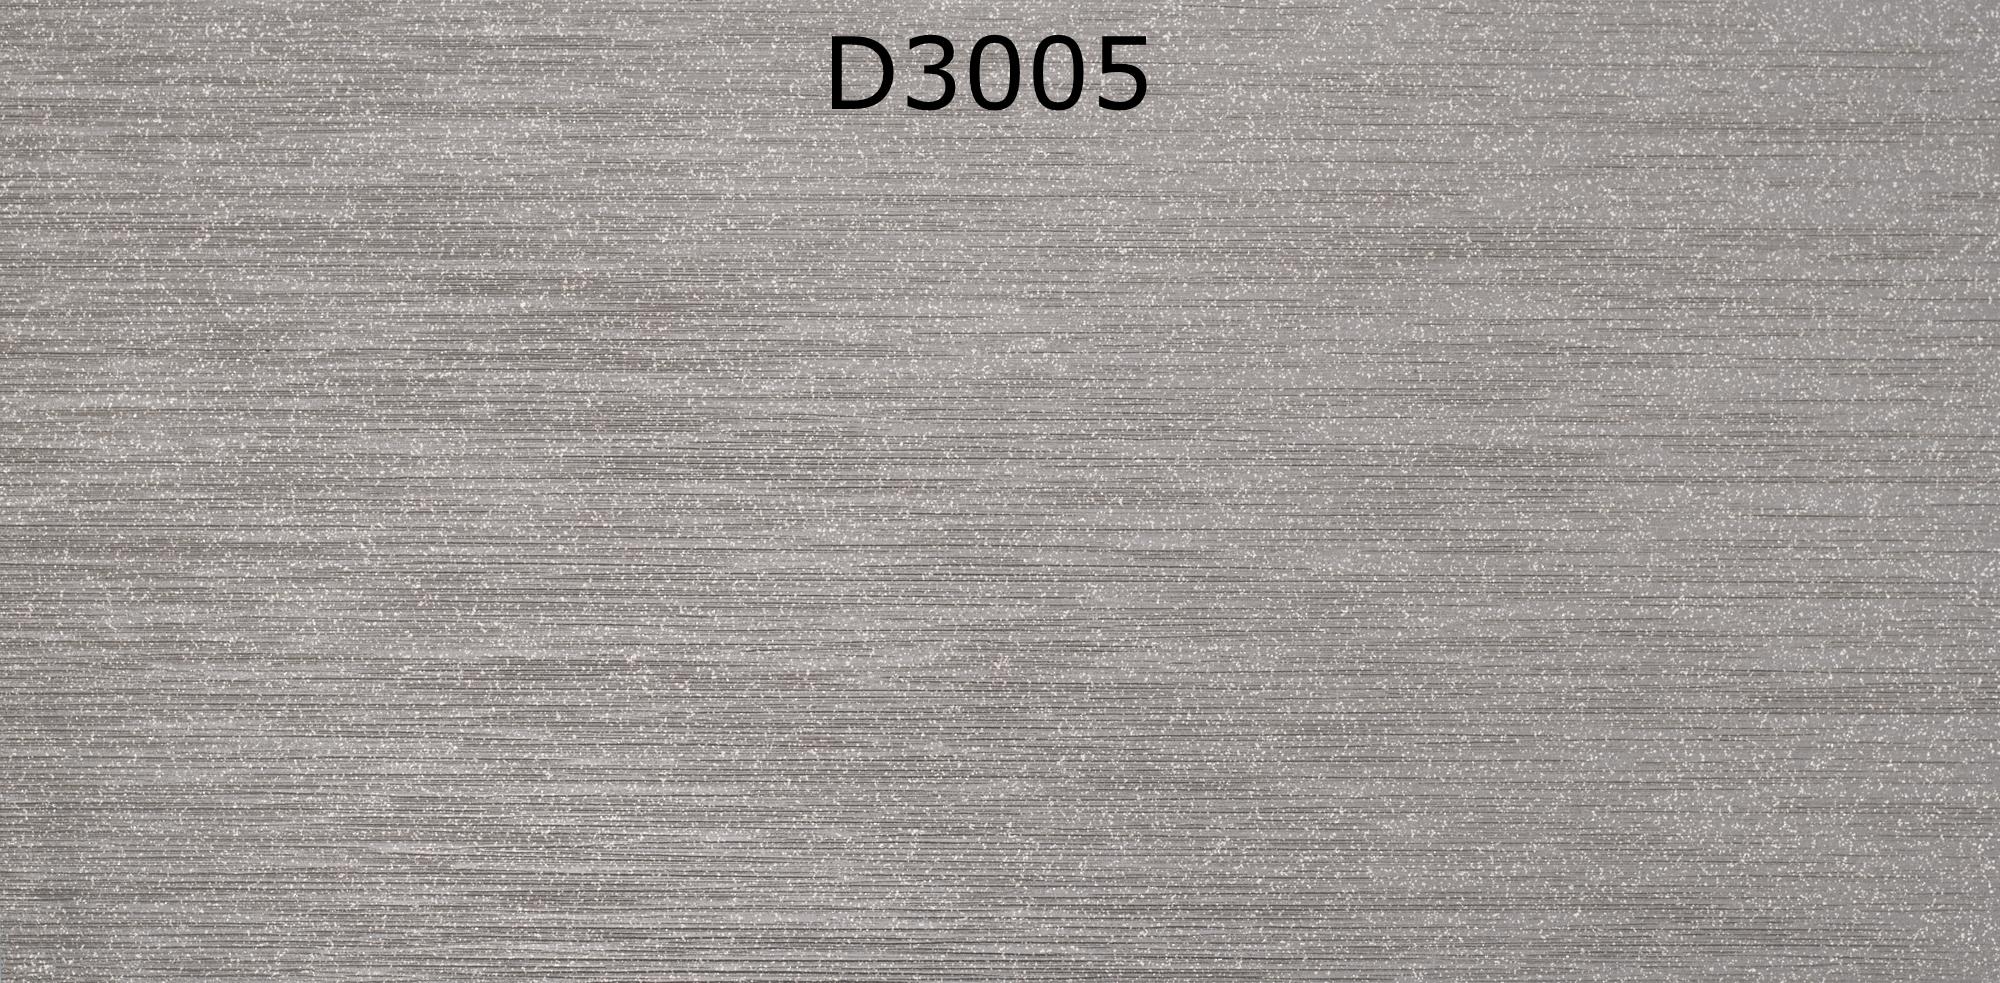 D3005